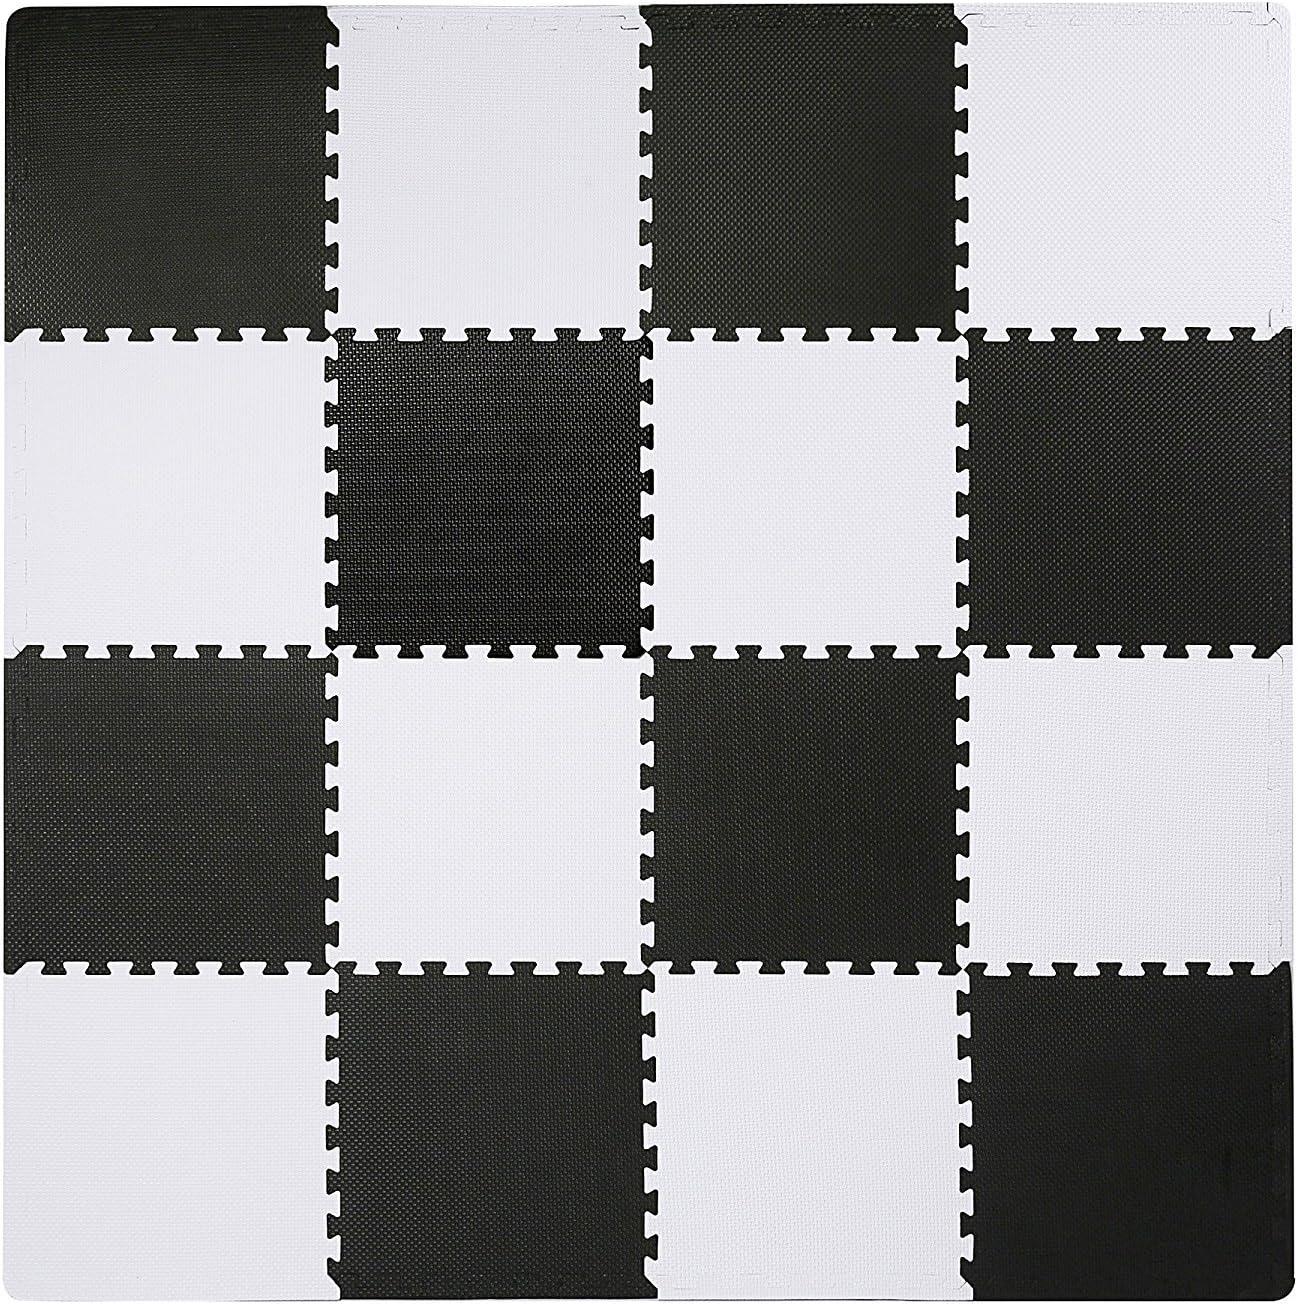 Superjare Interlocking Floor Tiles, 16 Tiles EVA Foam Puzzle Mat with Borders - White and Black